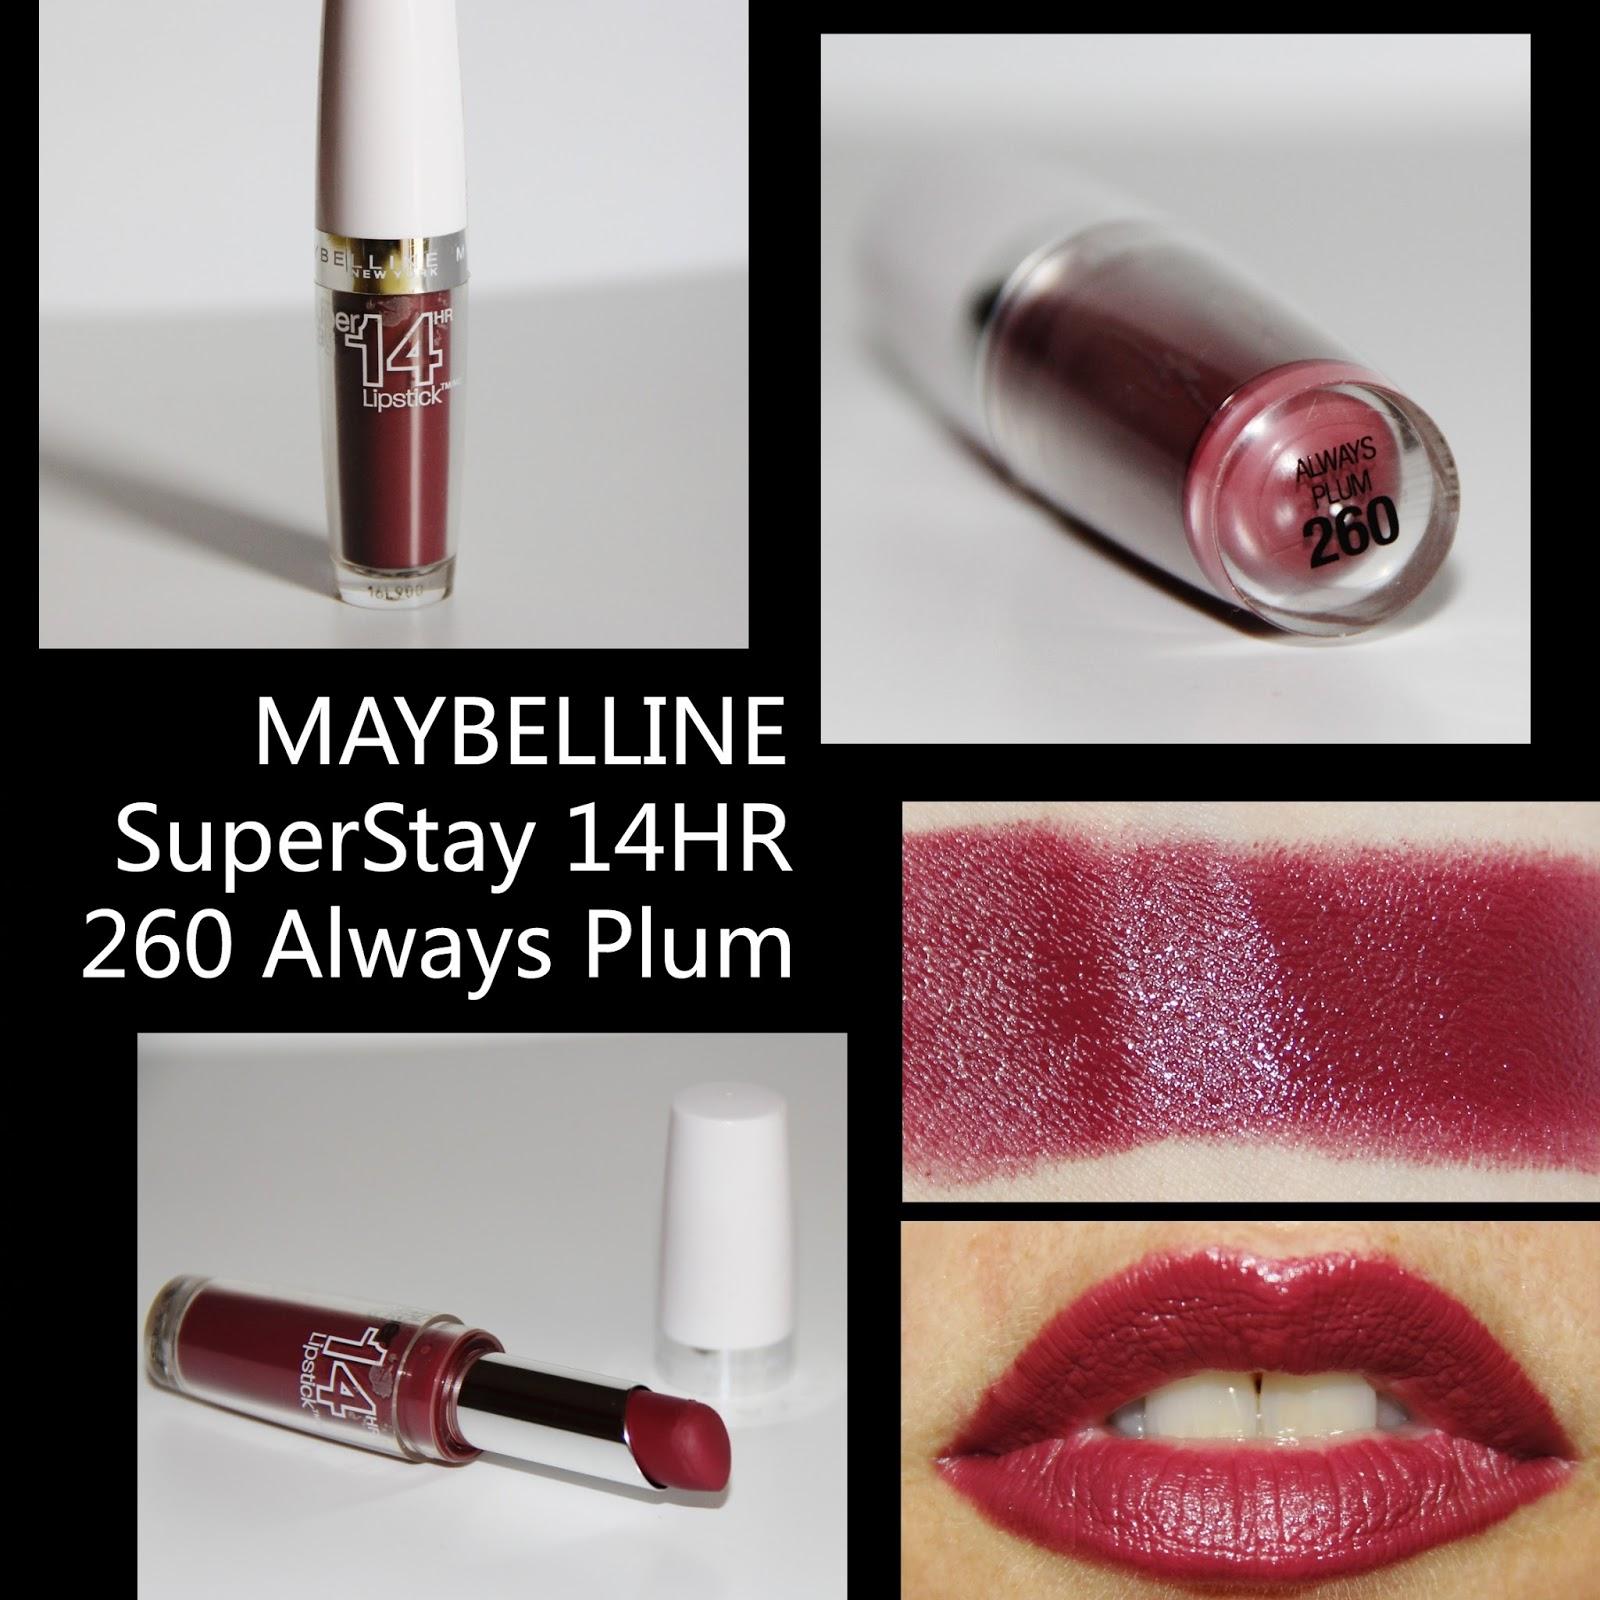 Maybelline plum lipstick